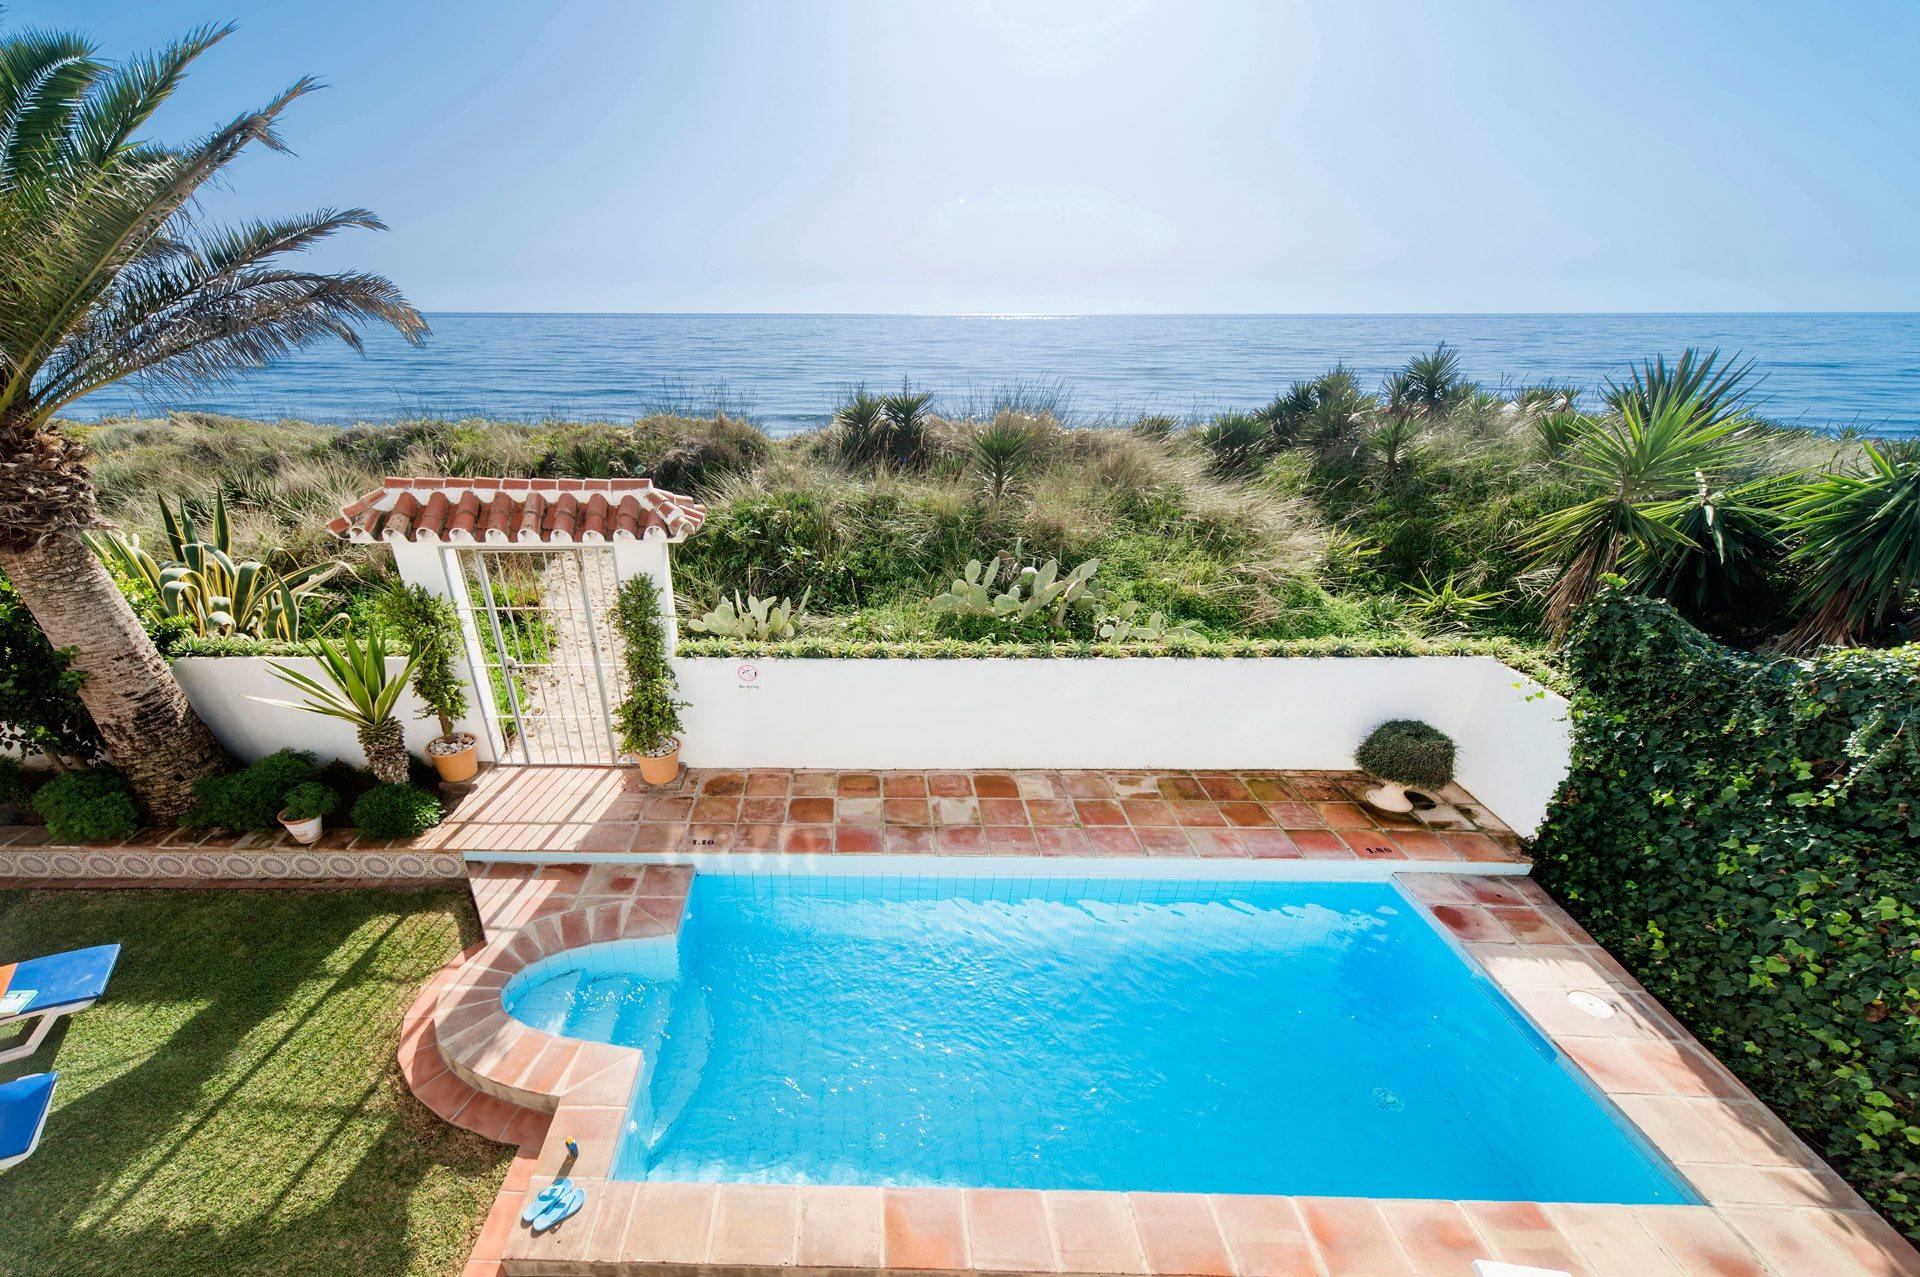 Villa Pedrosol, Marbella, Costa del Sol, Spain